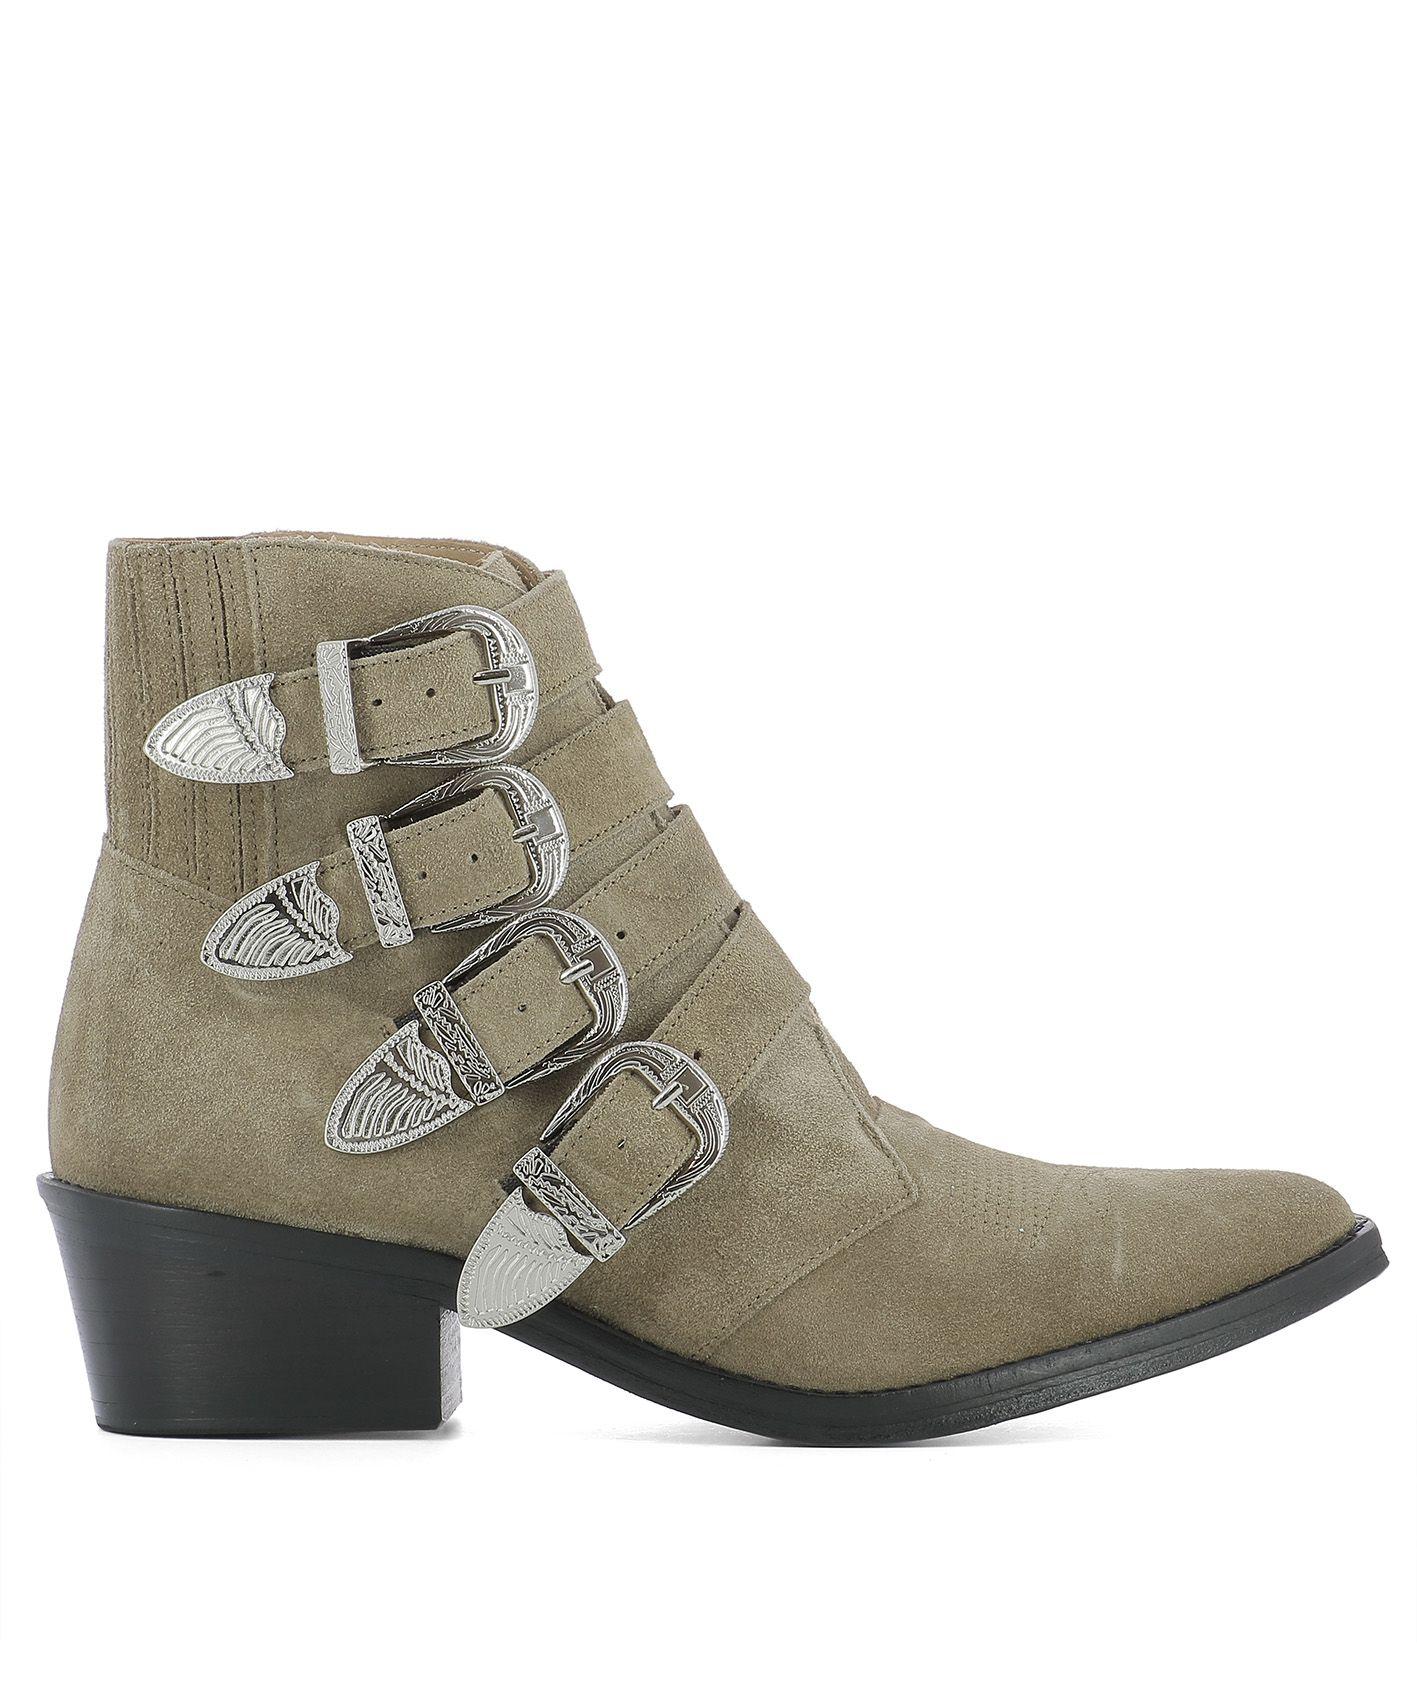 toga pulla beige suede ankle boots beige women 39 s boots italist. Black Bedroom Furniture Sets. Home Design Ideas